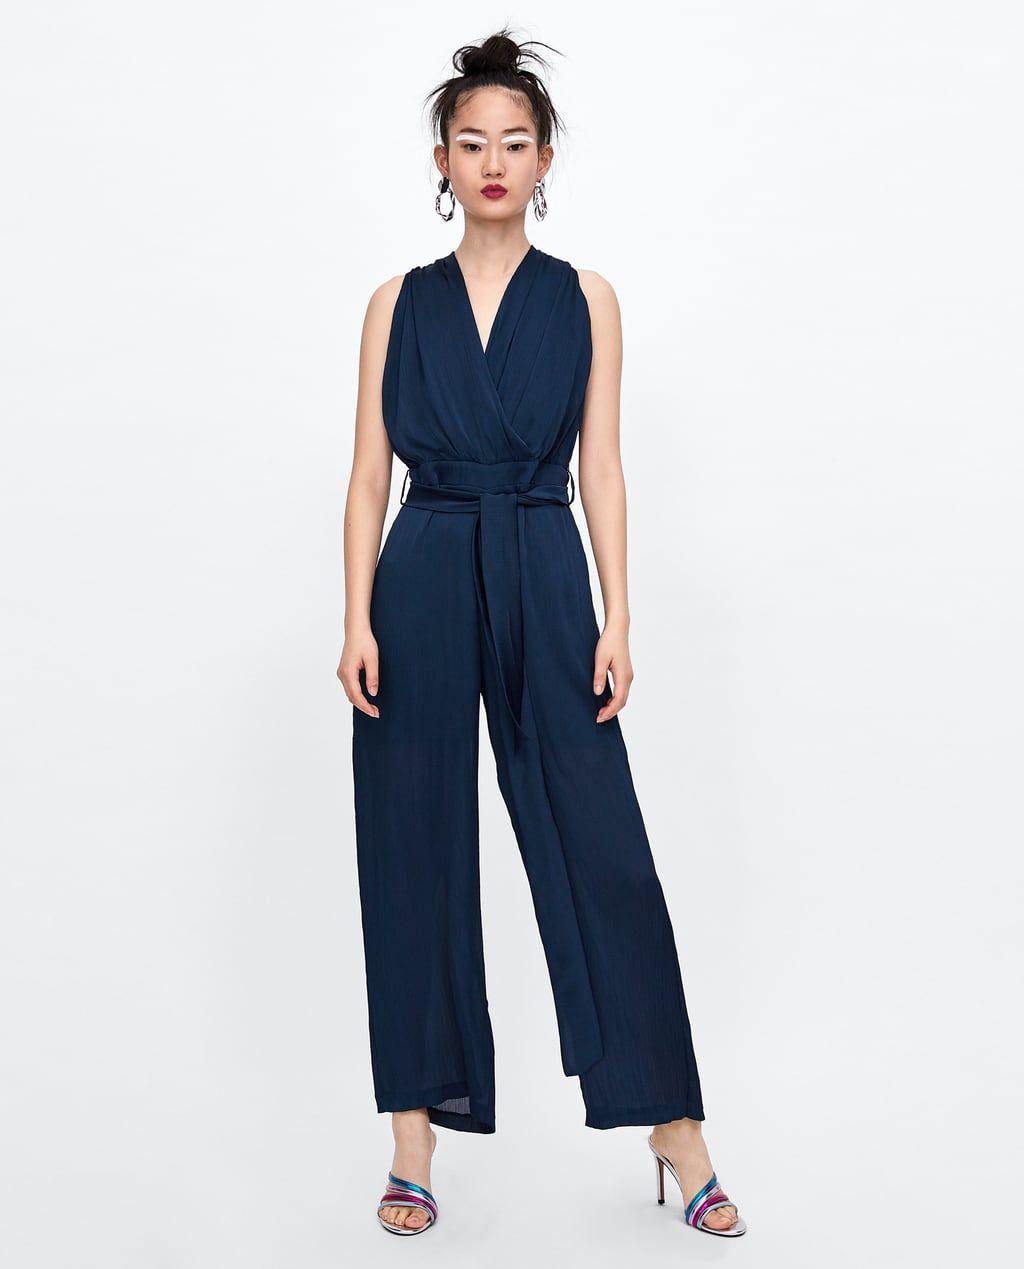 Vestiti Cerimonia Zara 2018.Pin Su Elegant Outfit